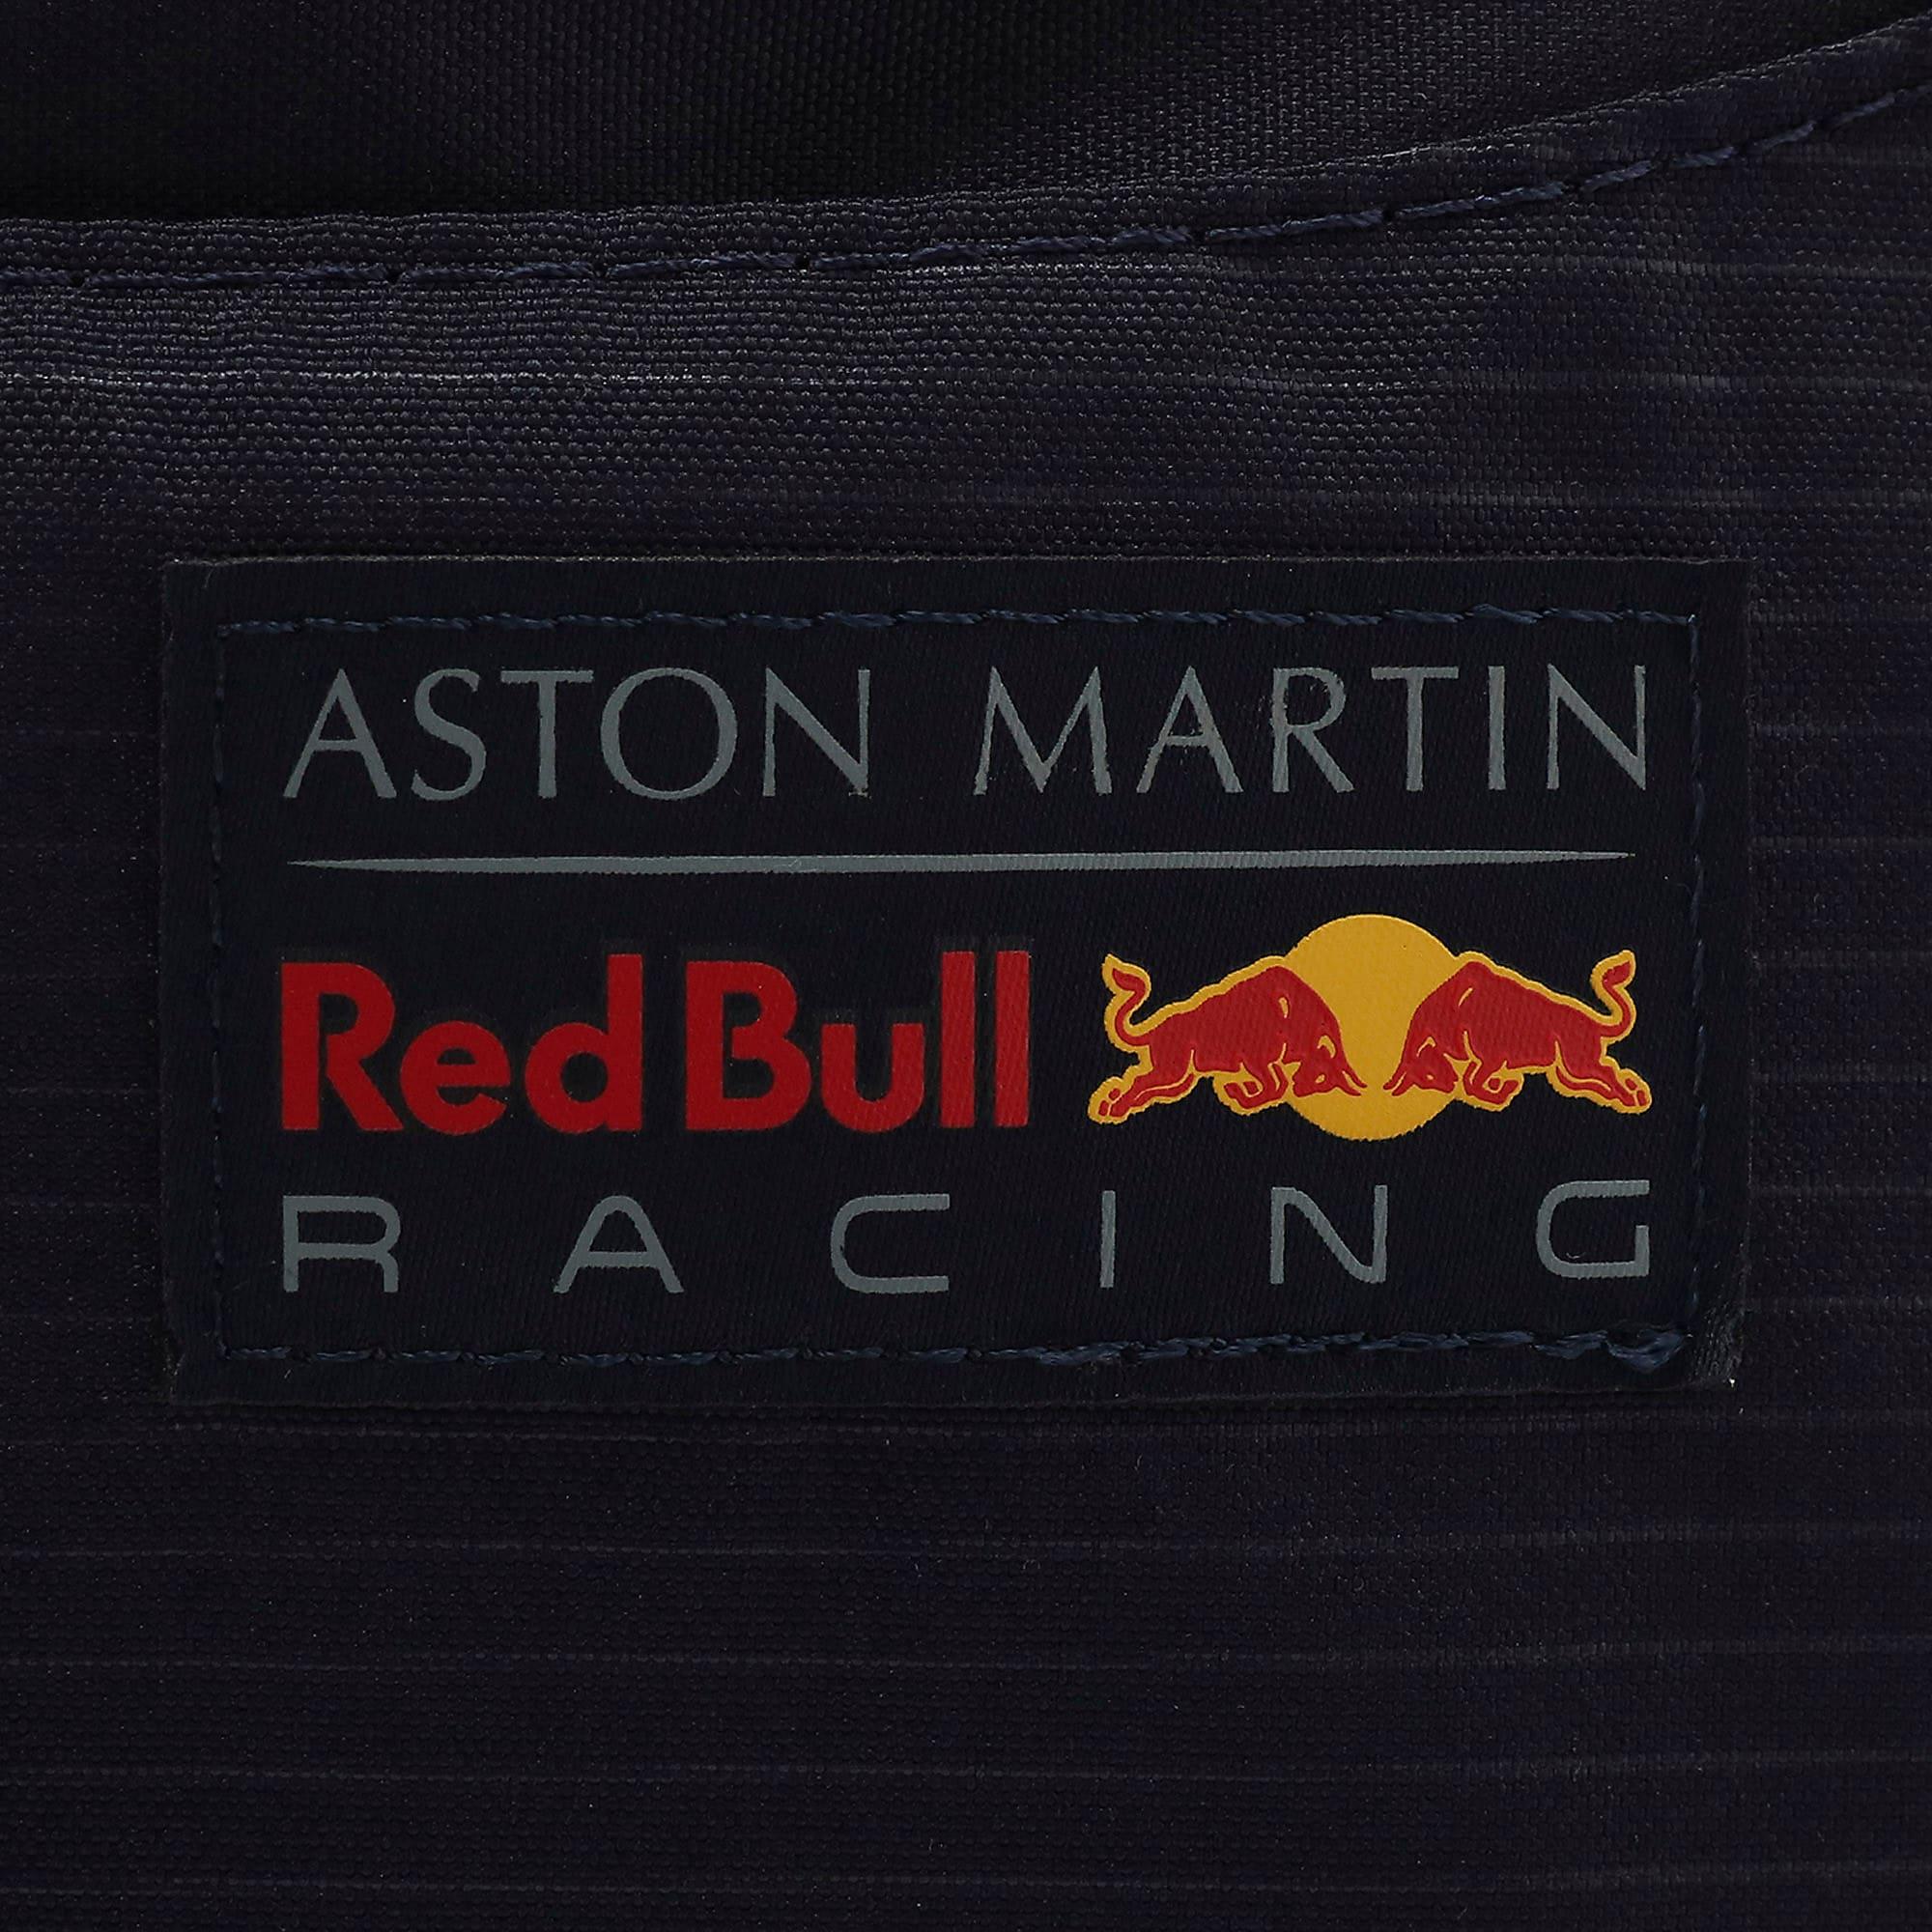 Thumbnail 7 of ASTON MARTIN RED BULL RACING レプリカ ショルダーバッグ 21L, NIGHT SKY, medium-JPN